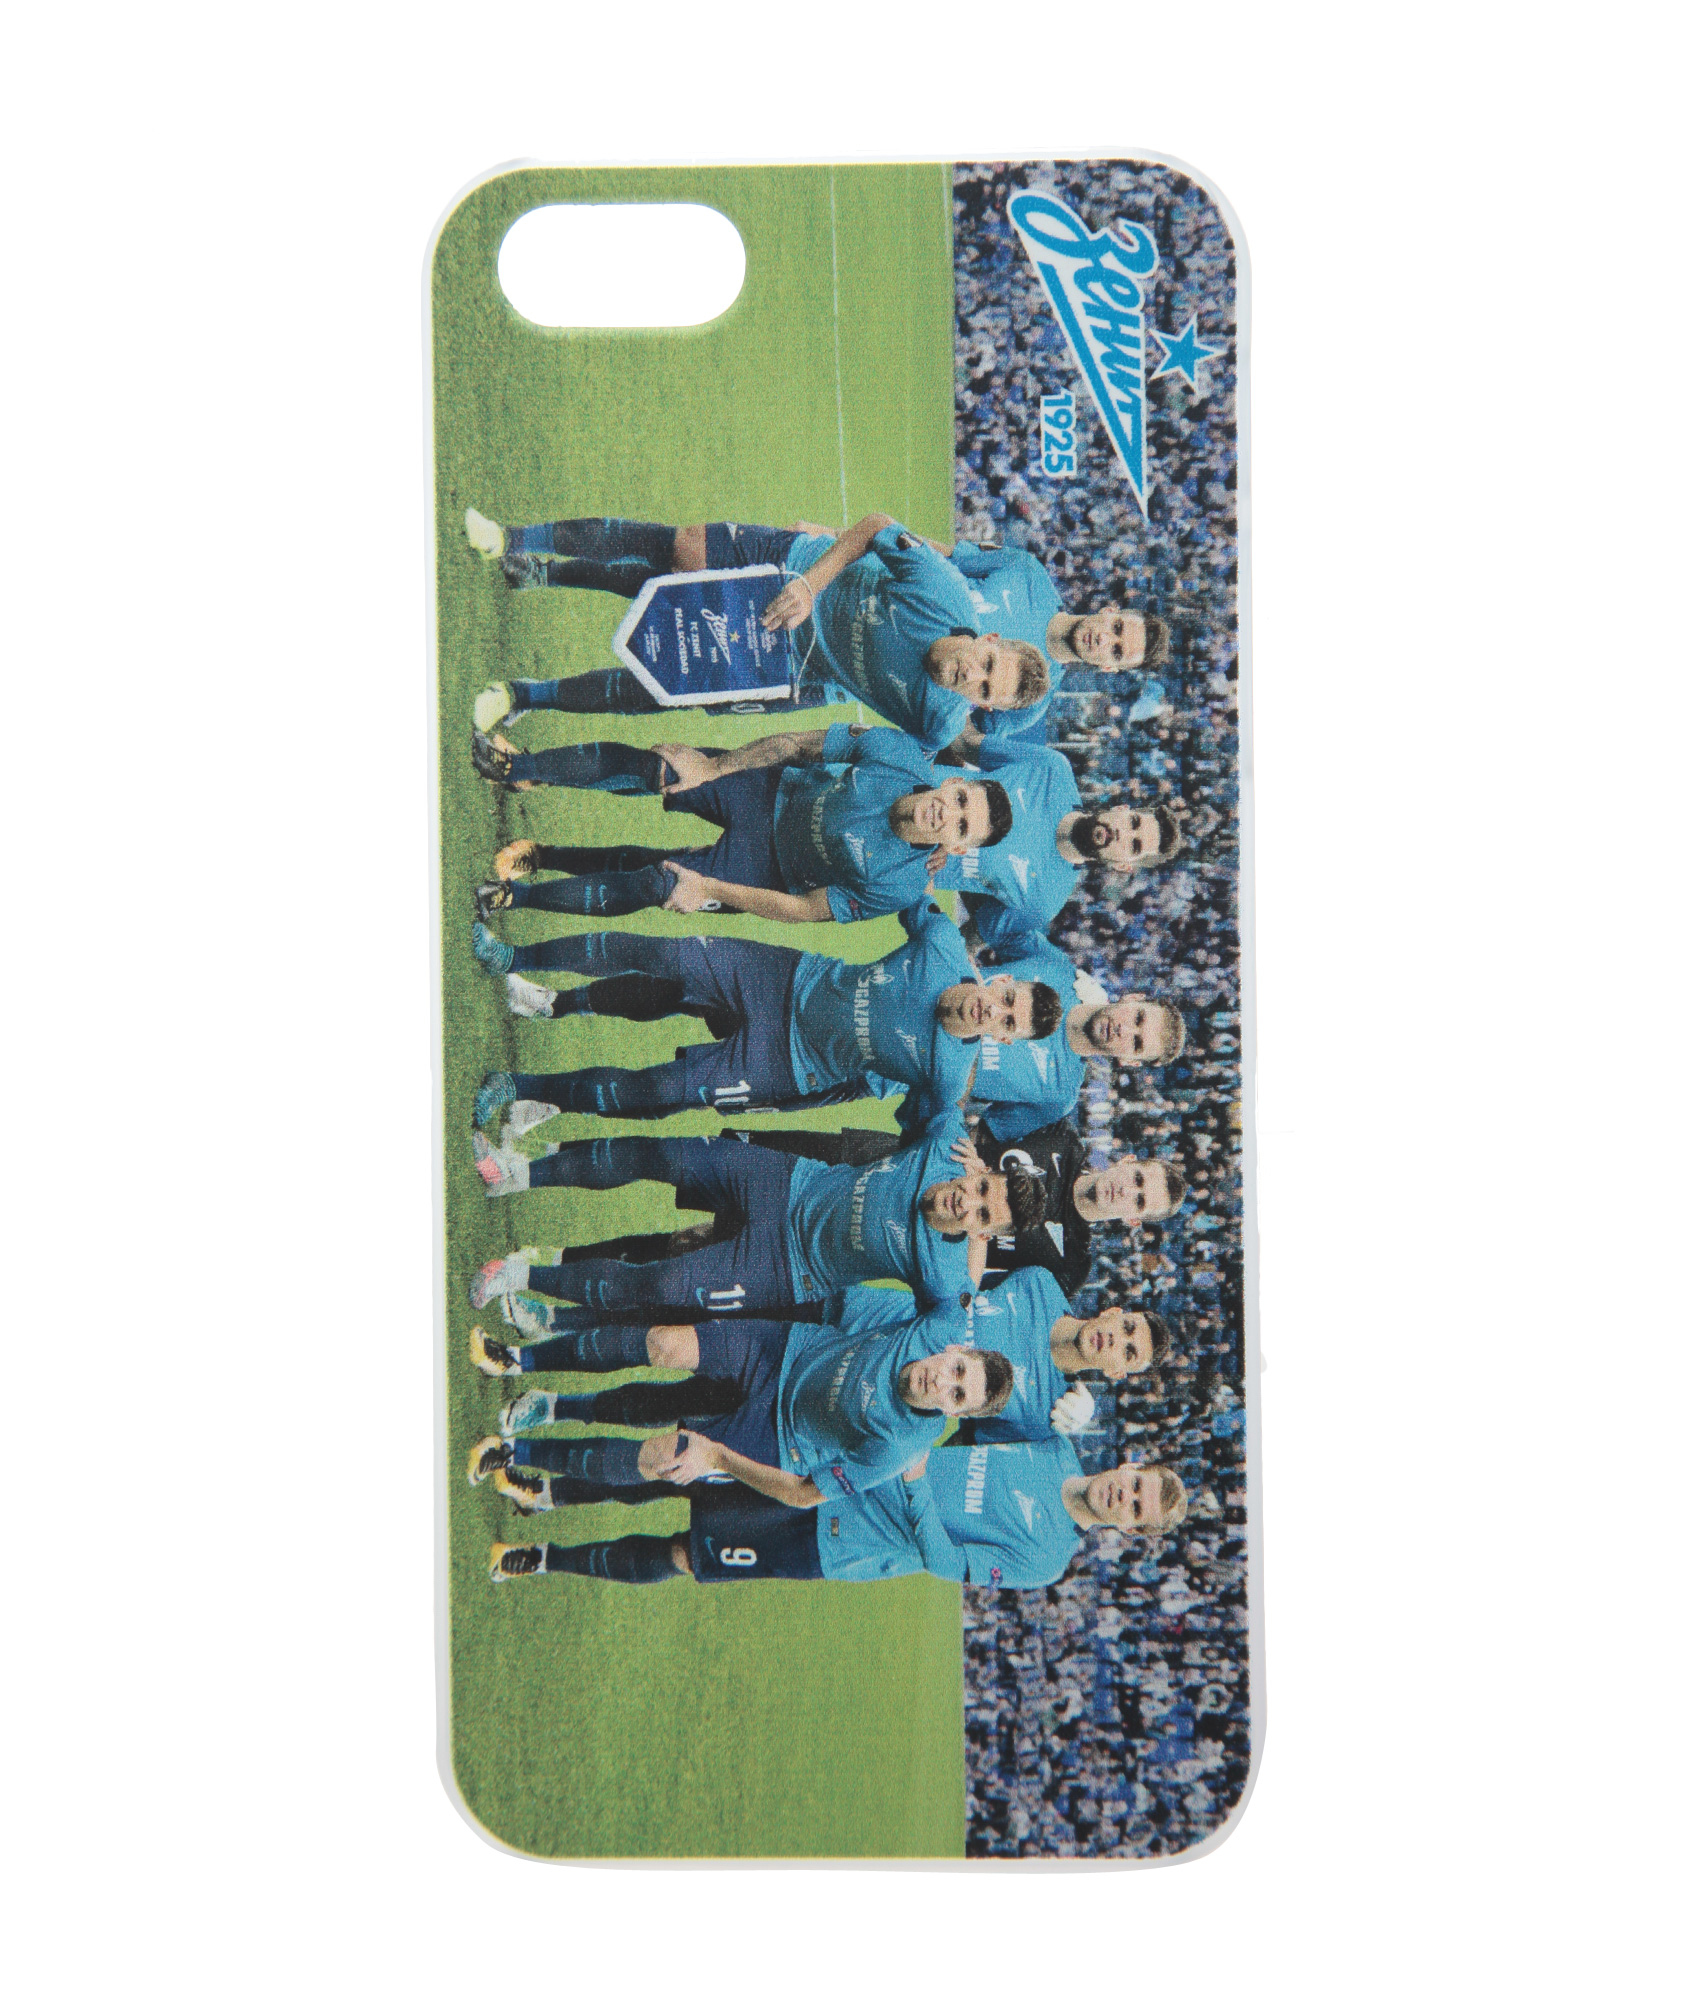 Чехол для IPhone 5/5S/SE «Команда 2017» Зенит клип кейс ibox crystal для iphone se 5 5s серый